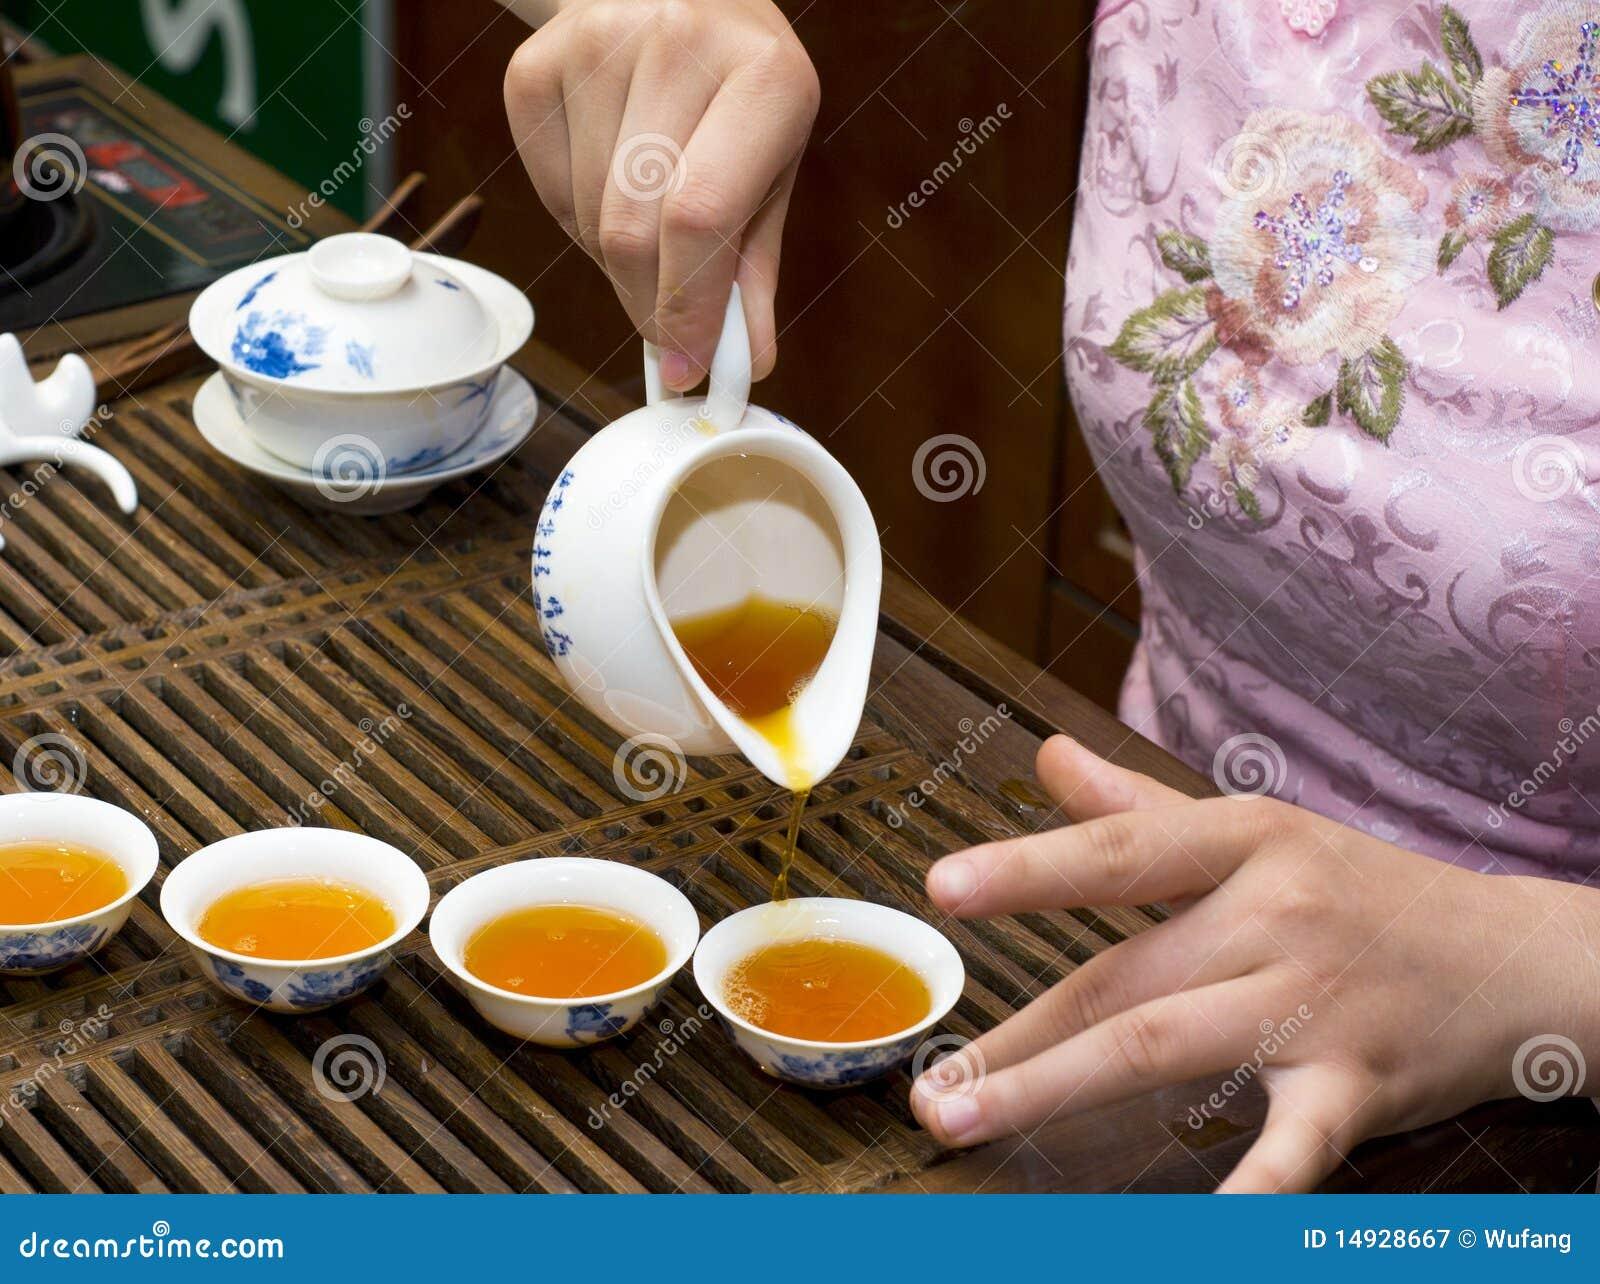 Tea Culture Movie HD free download 720p